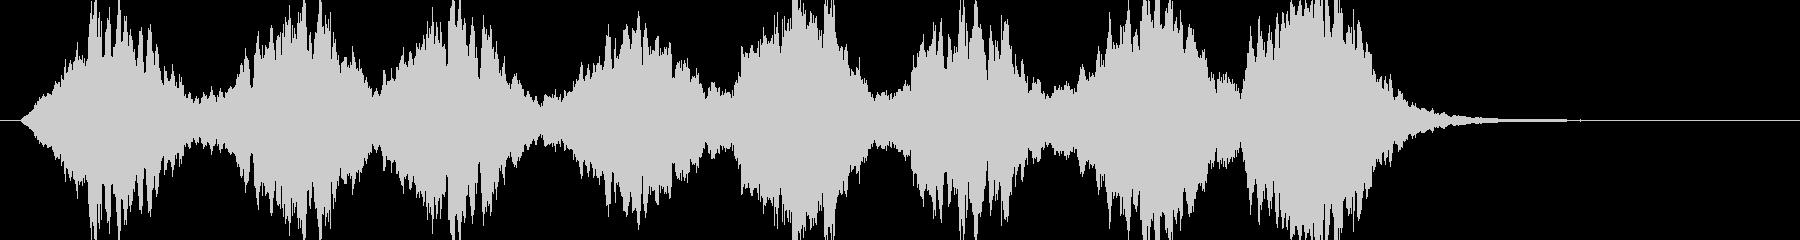 BGM11の未再生の波形